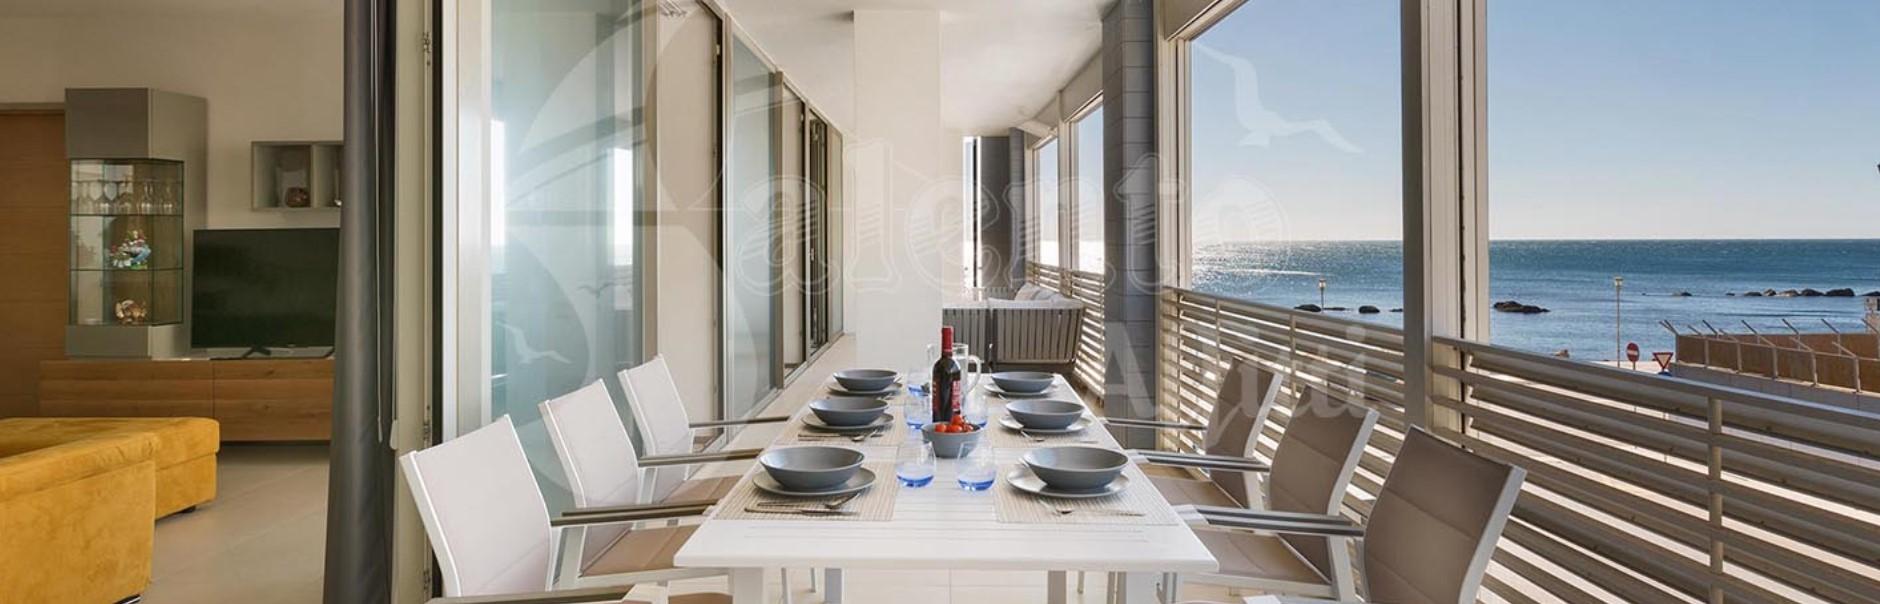 Appartamento Le Vele Luxury - Gallipoli